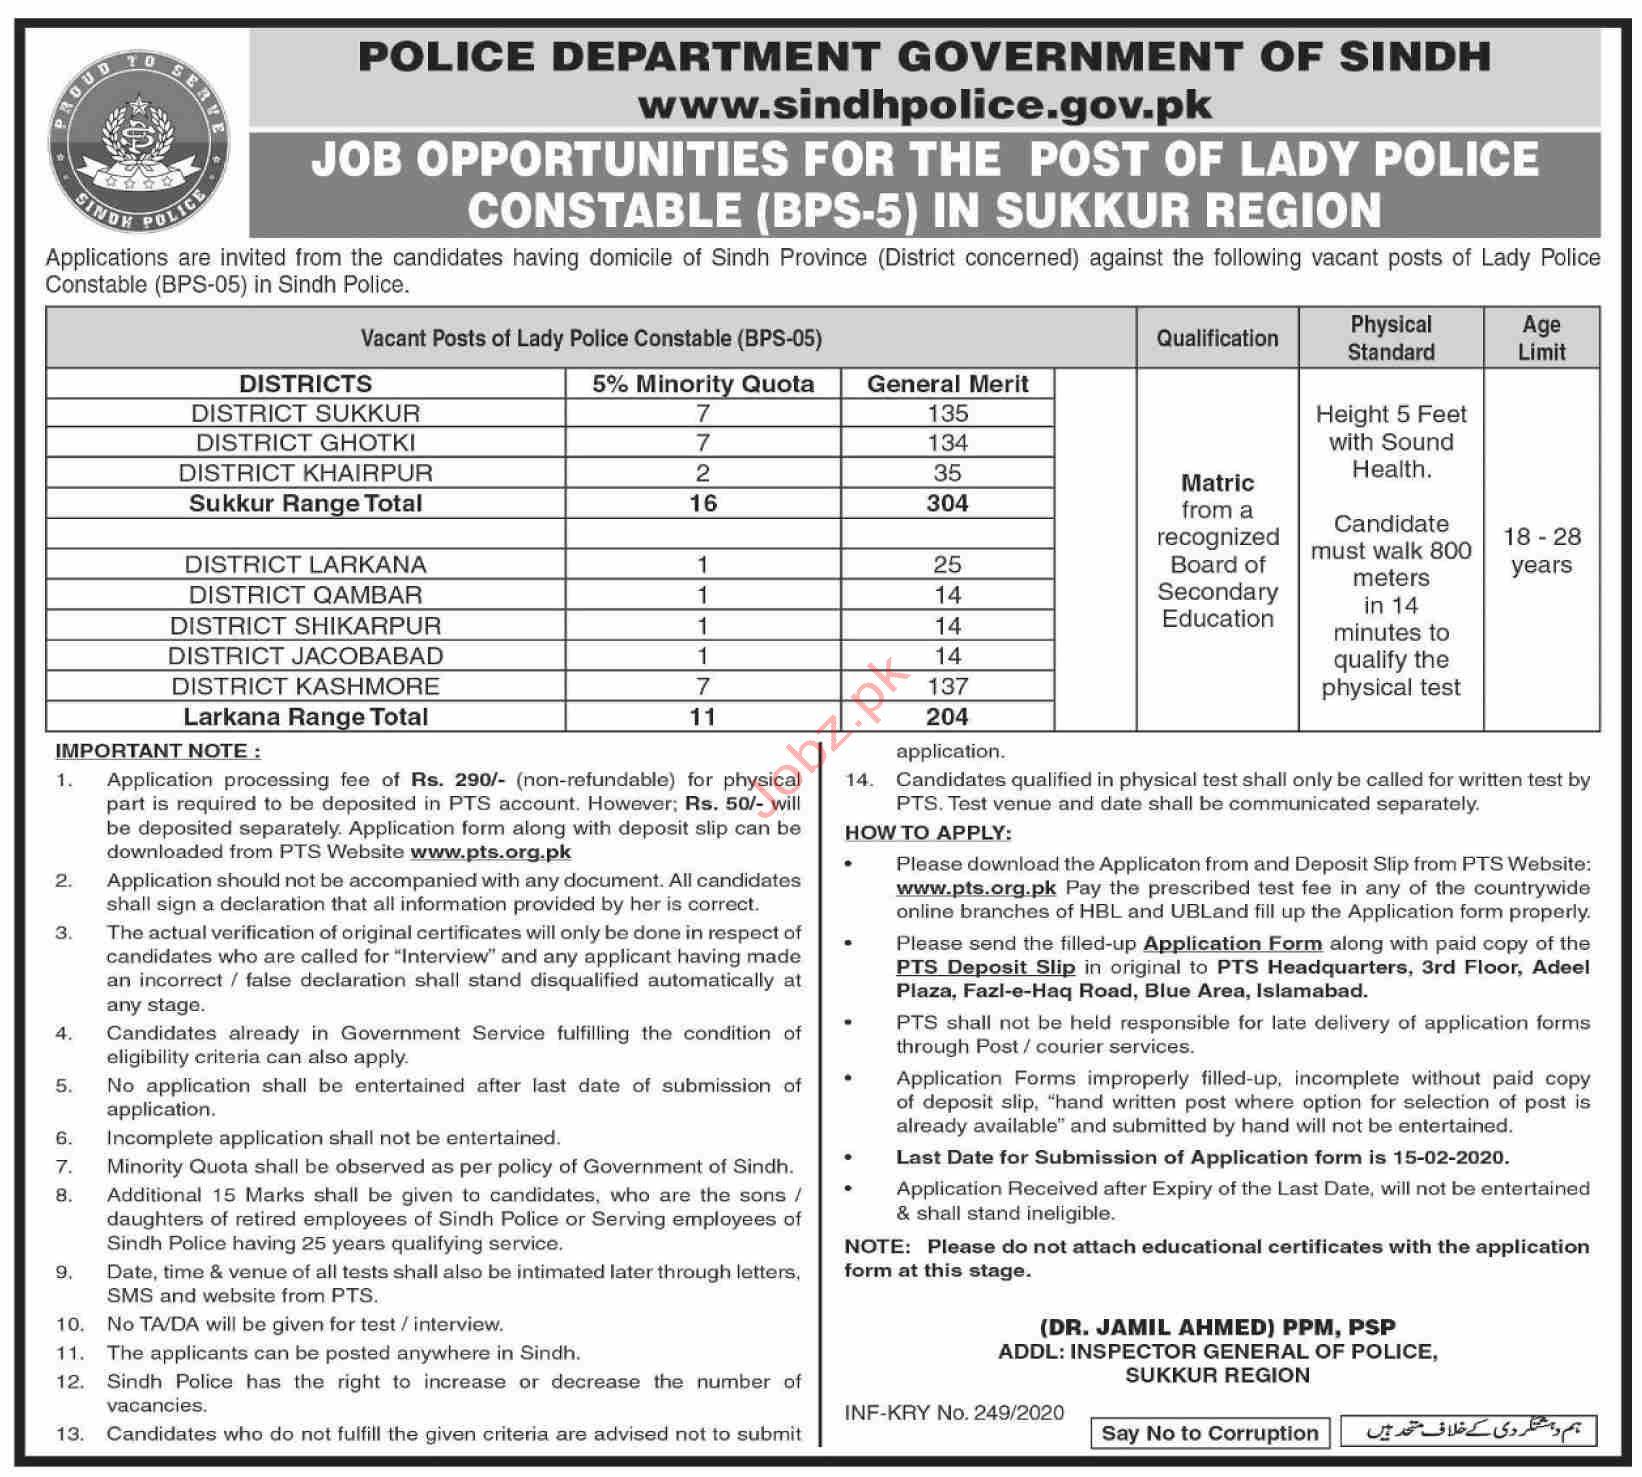 Police Department Govt of Sindh Sukkur Jobs 2020 Via PTS